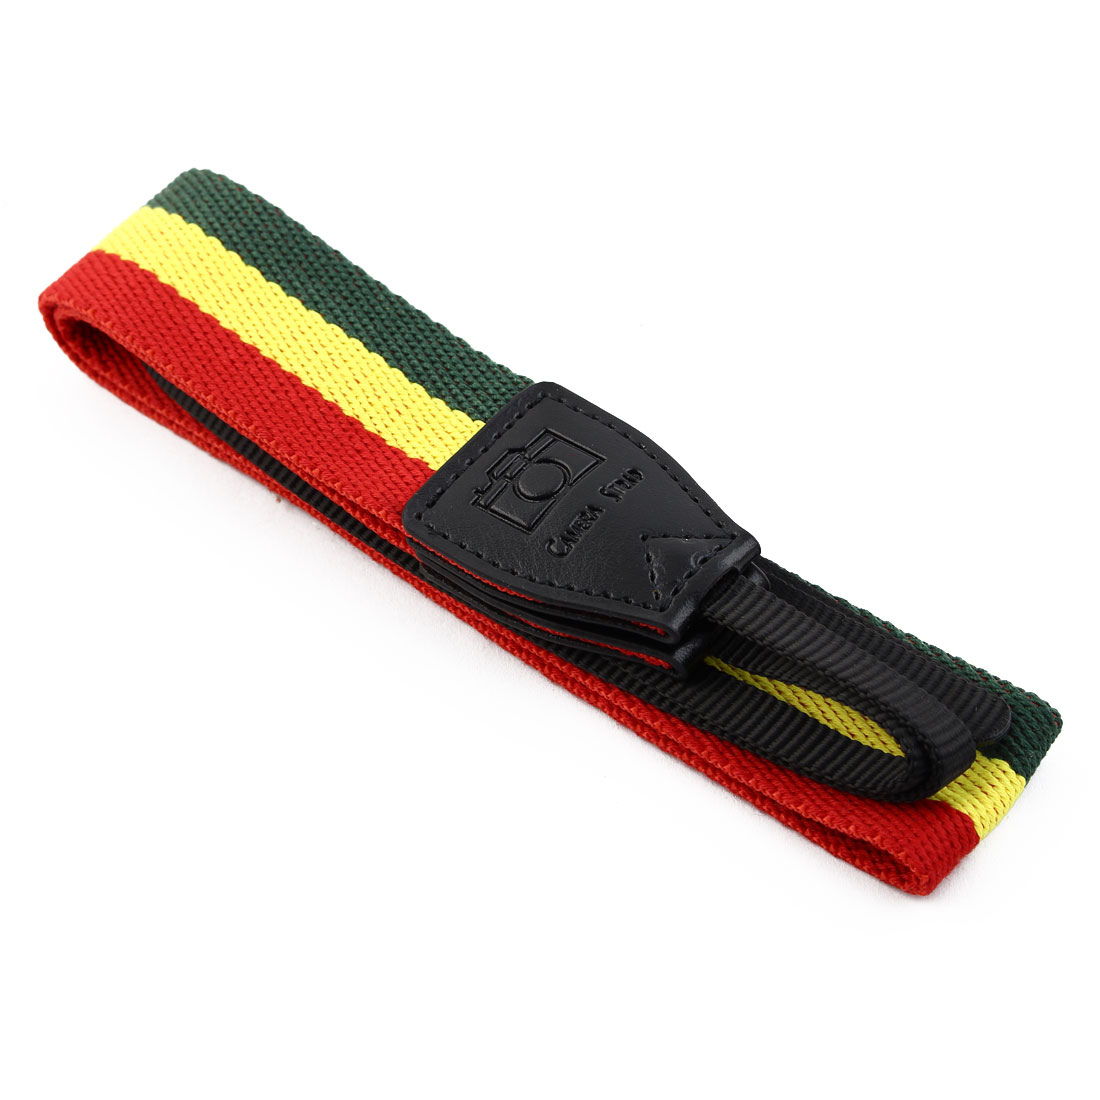 SHETU Authorized SLR Camera Anti-slip Shoulder Neck Strap Belt Green Yellow - image 5 de 6